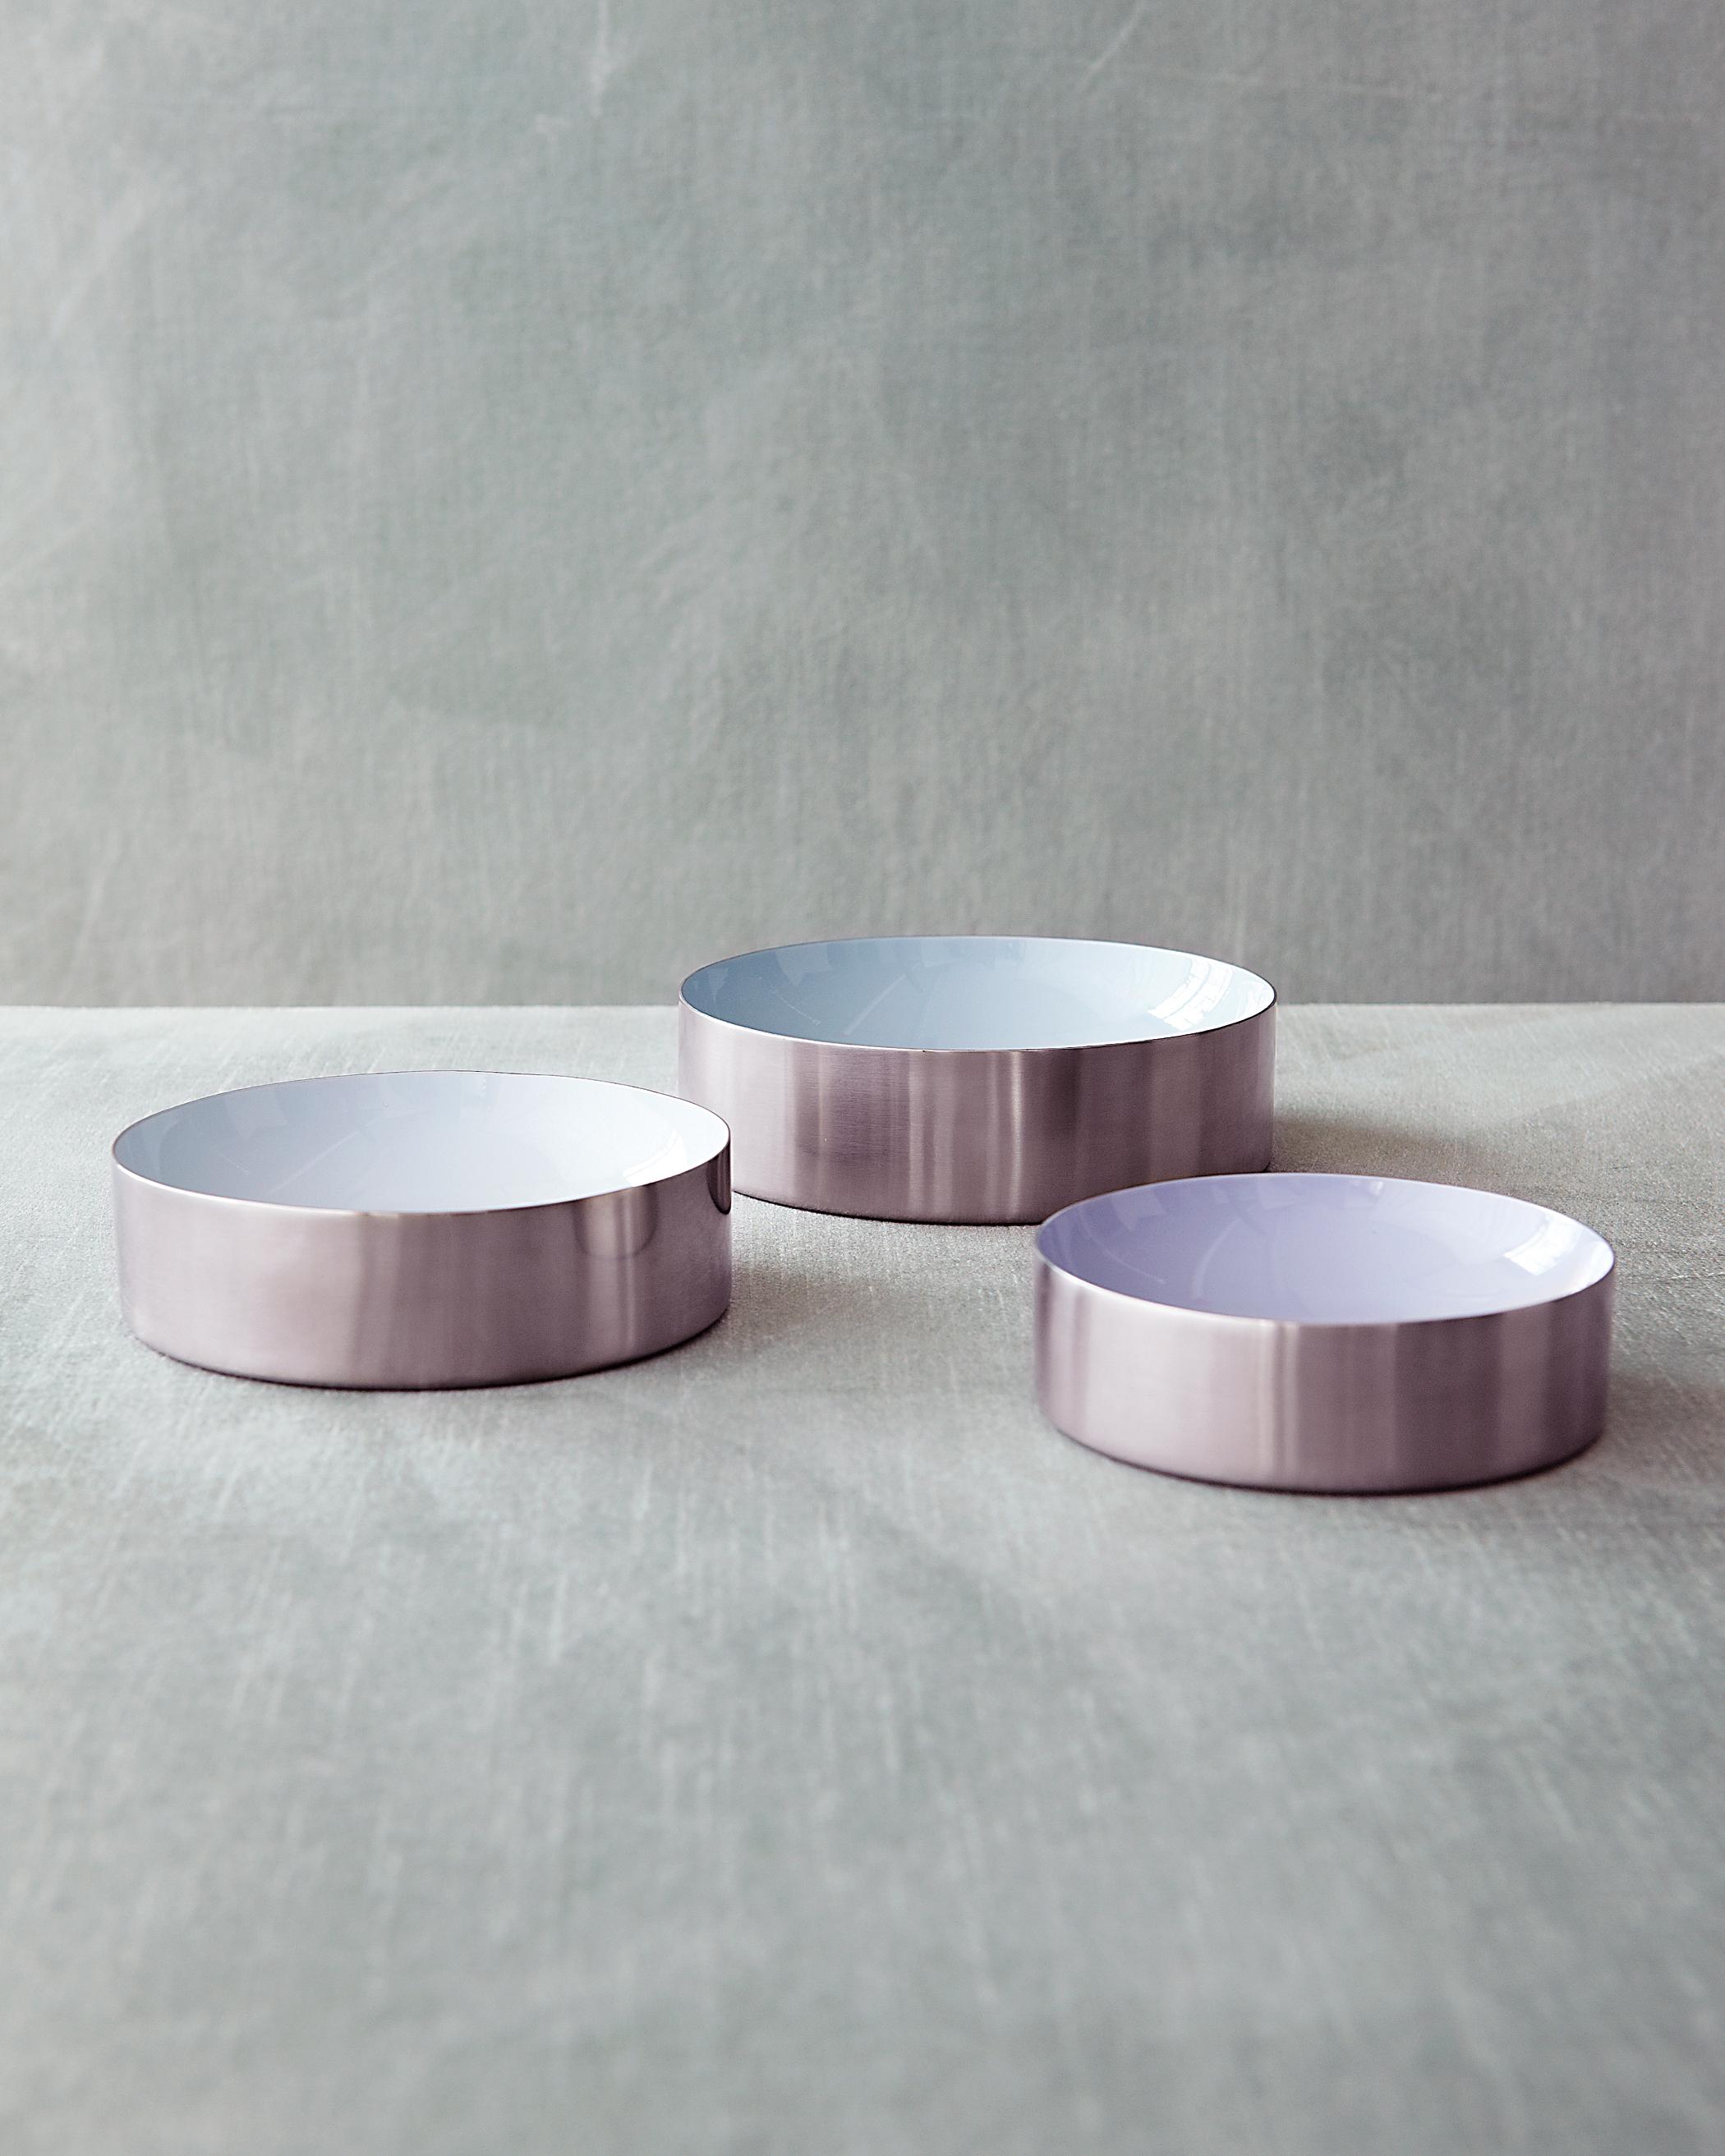 bowls-0811mwd107434.jpg